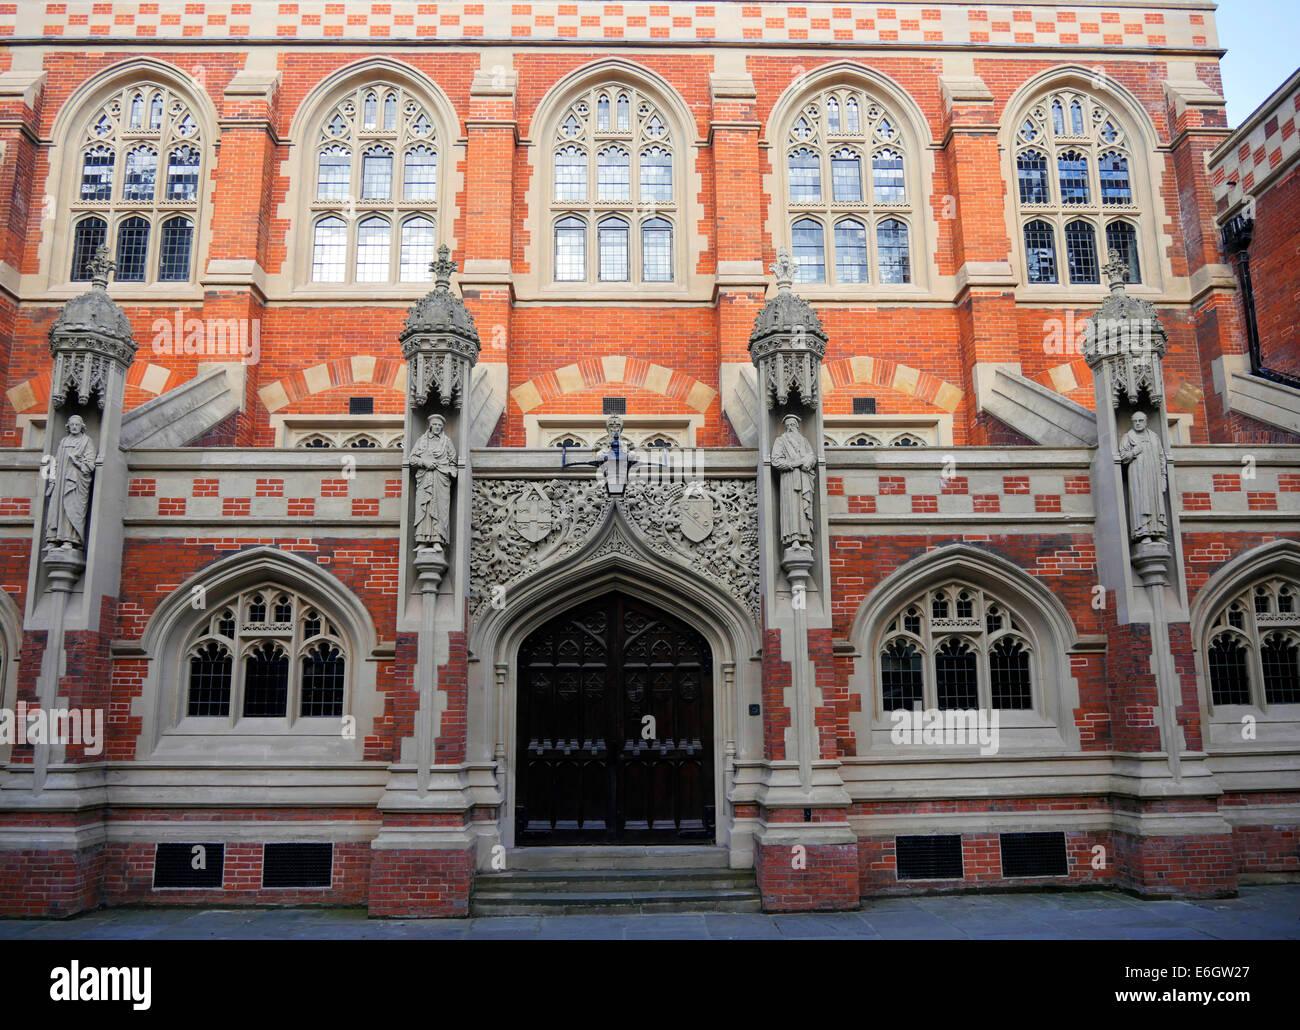 St Johns College Cambridge - Stock Image